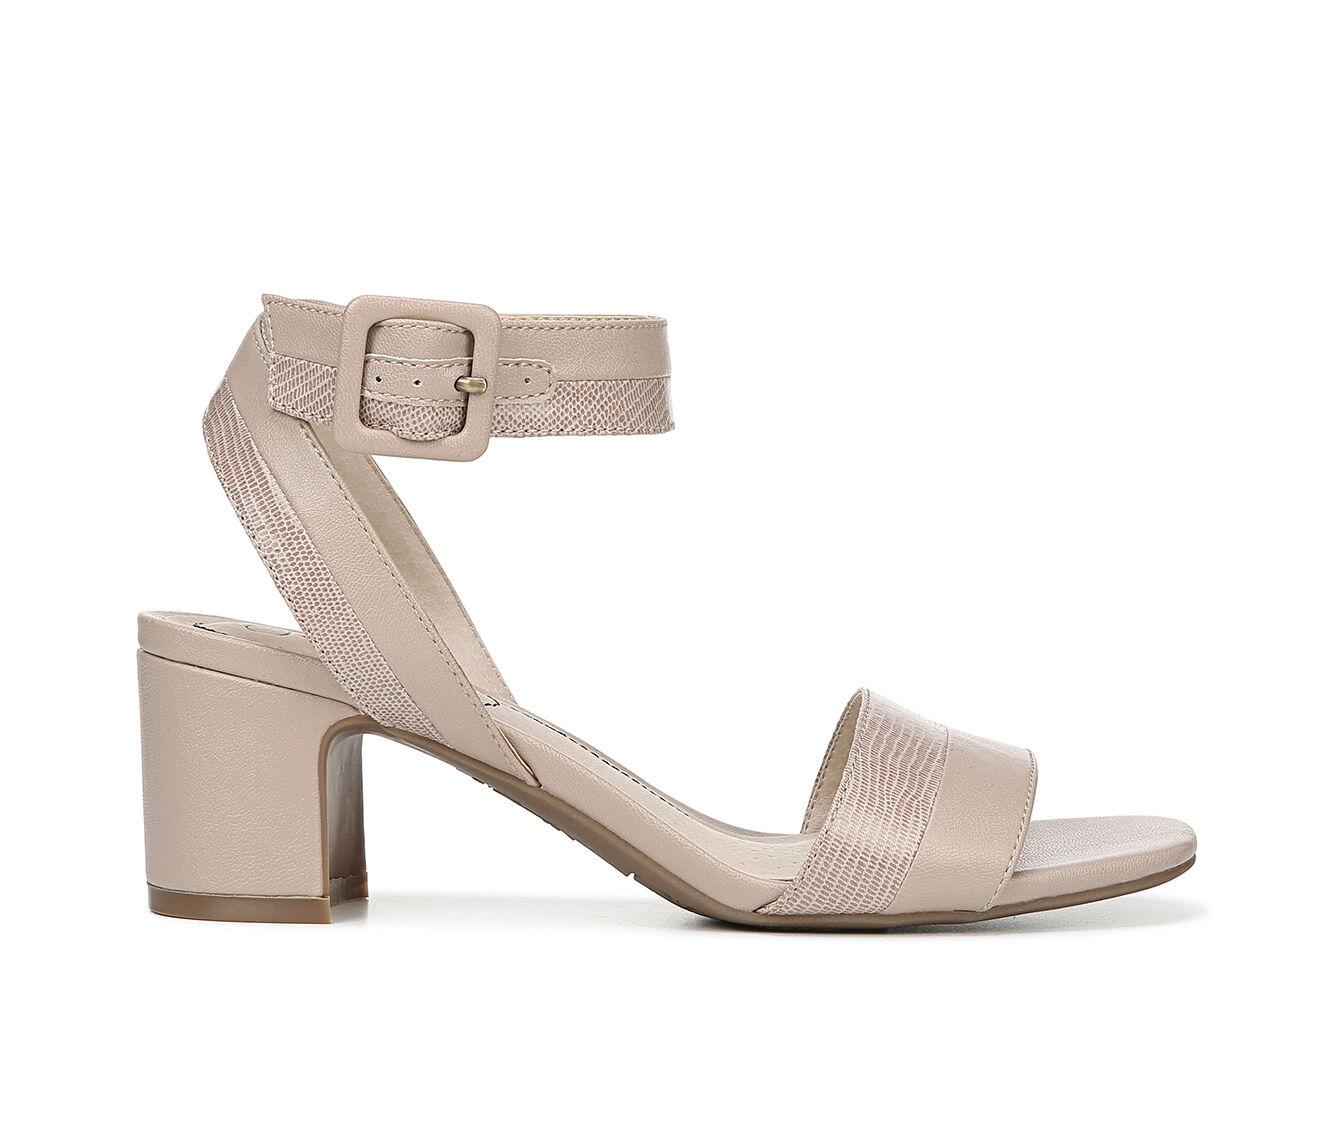 uk shoes_kd5790